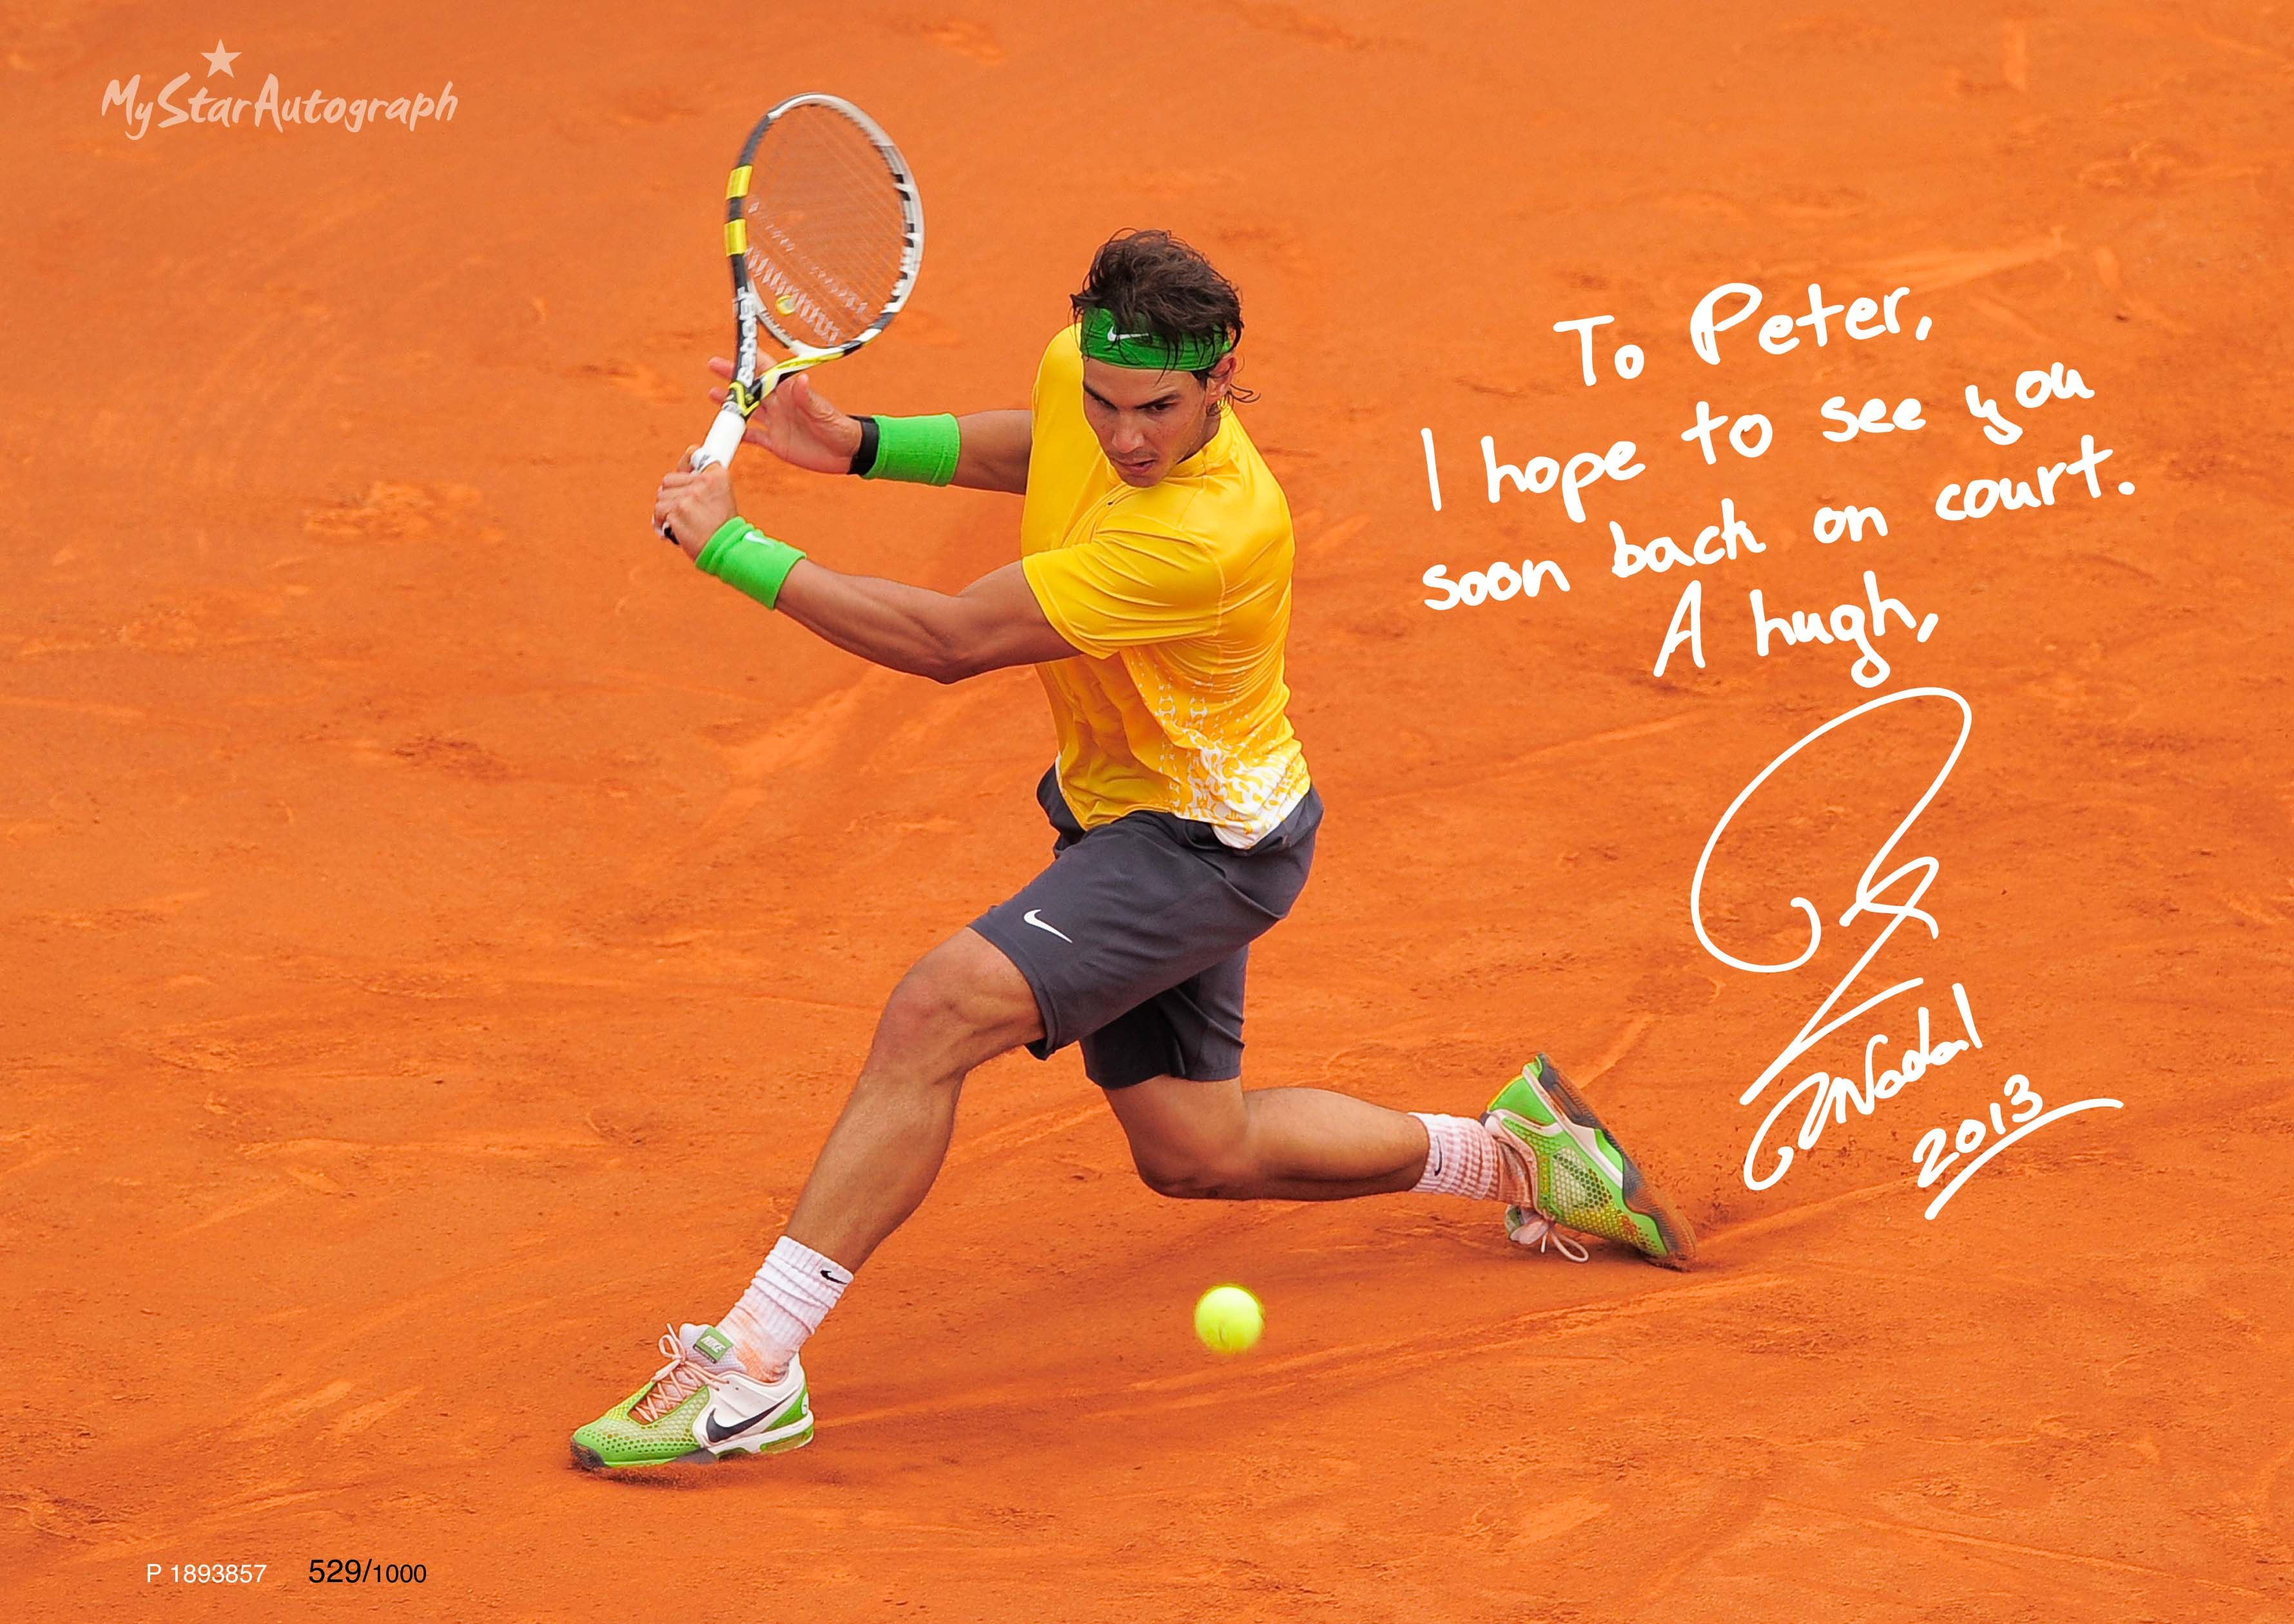 Rafael nadal wallpaper 31 34 male players hd backgrounds - Rafa Nadal Autograph 25 Http Rafanadal Mystarautograph Com Rafael